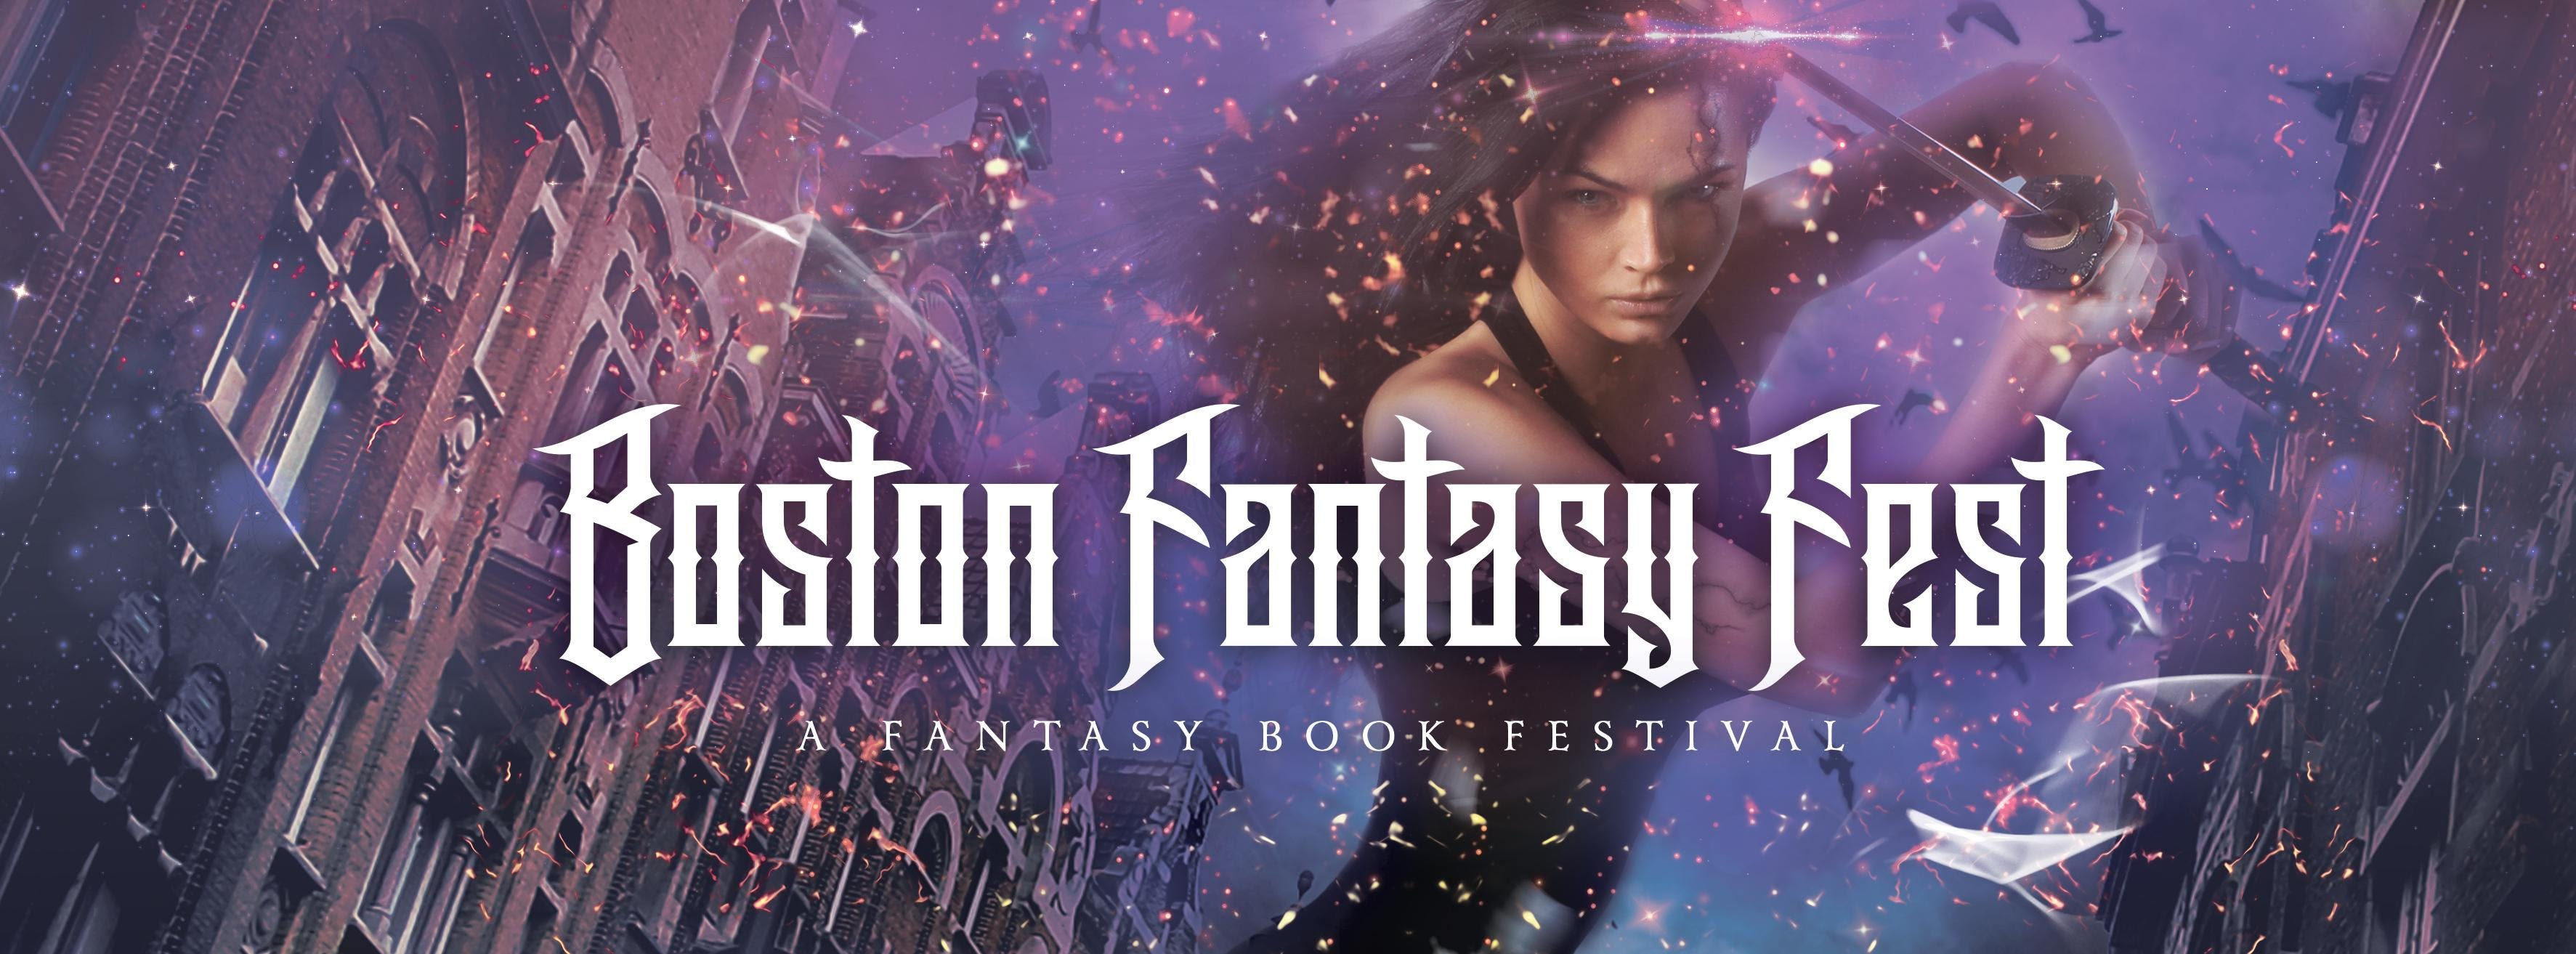 Boston Fantasy Fest 2018